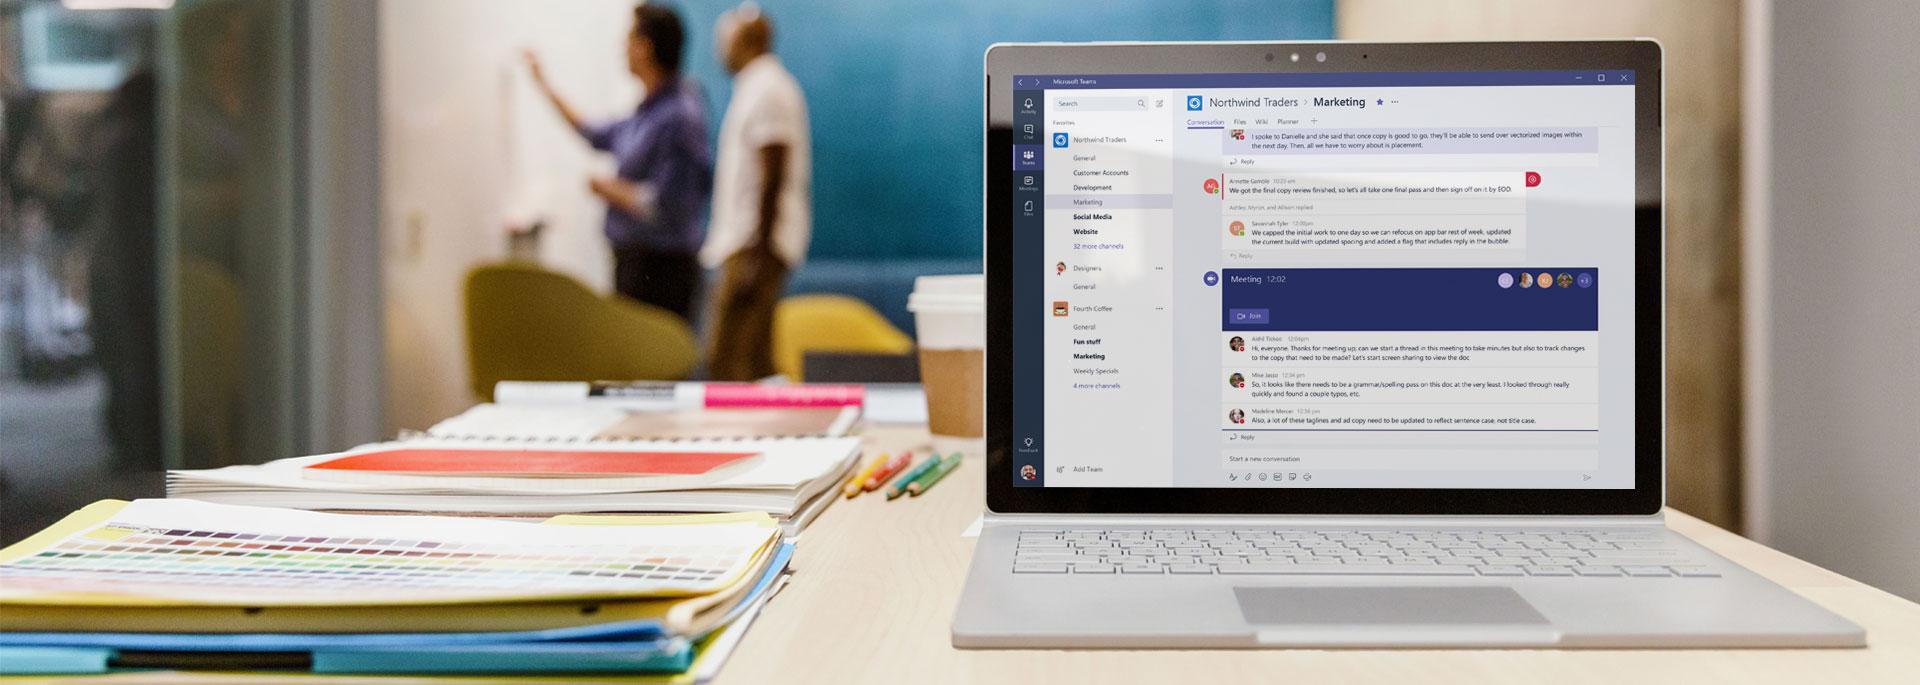 Tablet na kojem je prikazan razgovor u aplikaciji Microsoft Teams